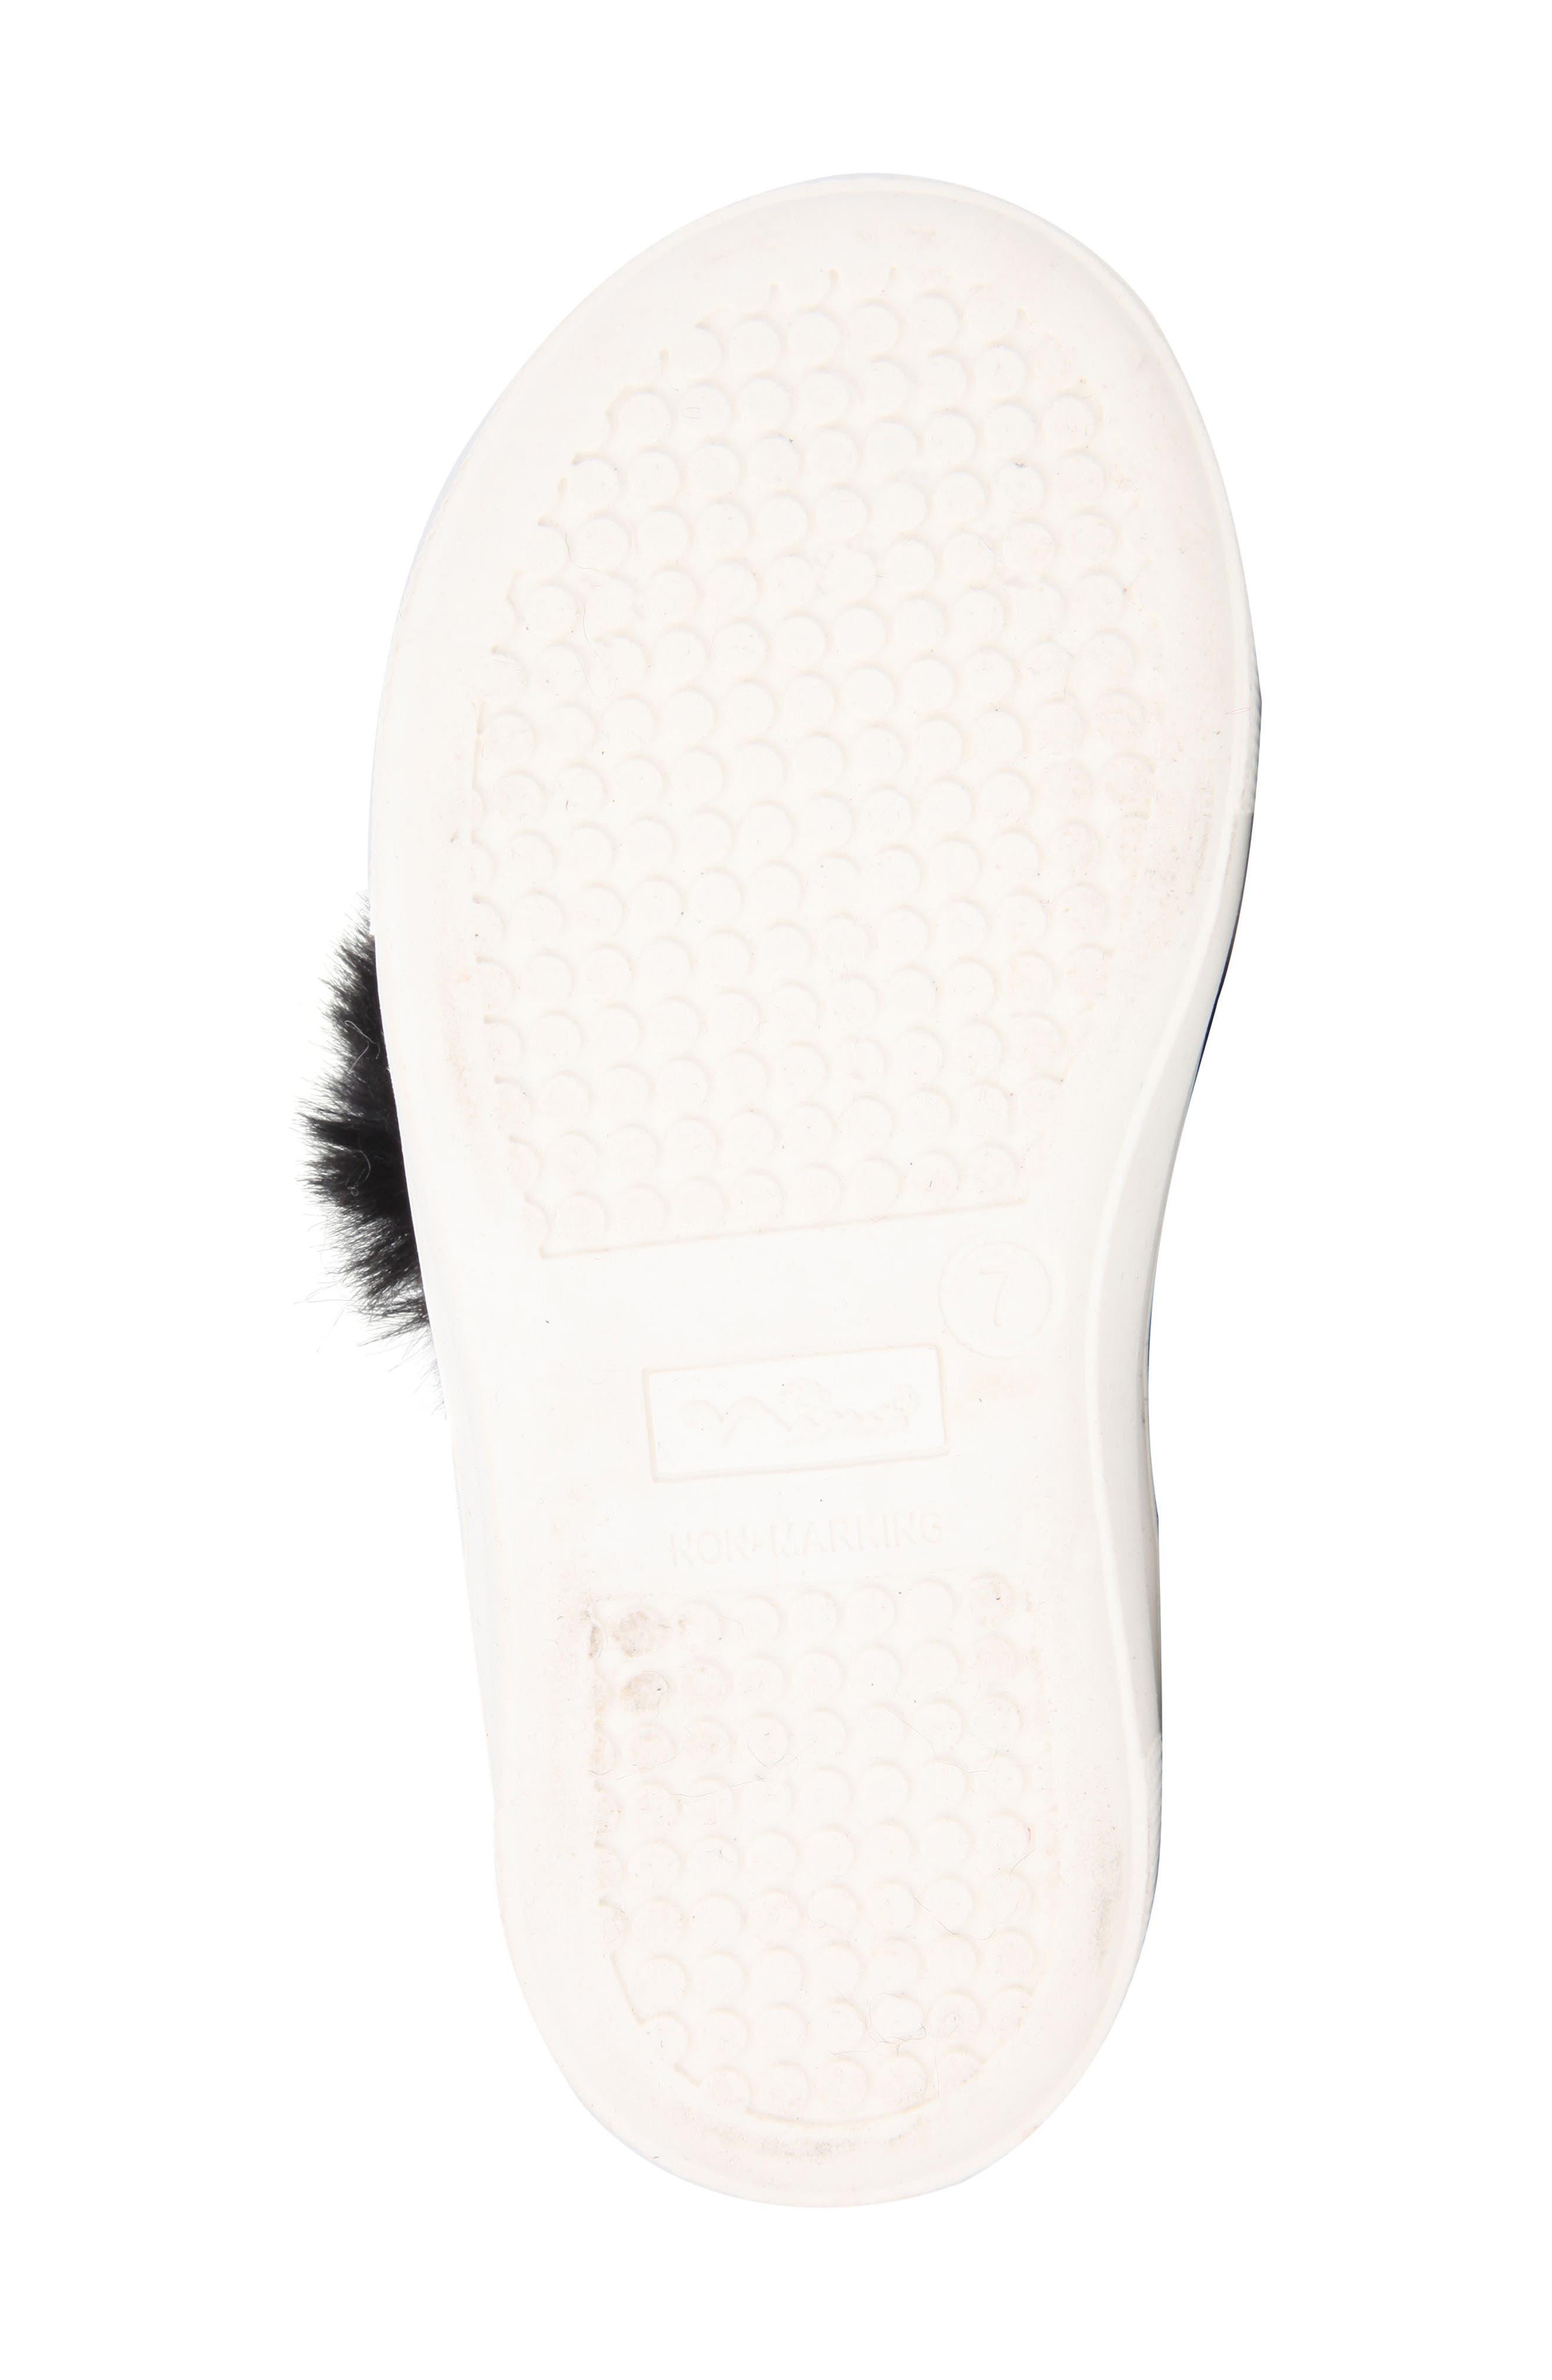 Helen Faux Fur Bootie Sneaker,                             Alternate thumbnail 6, color,                             Black Microsuede